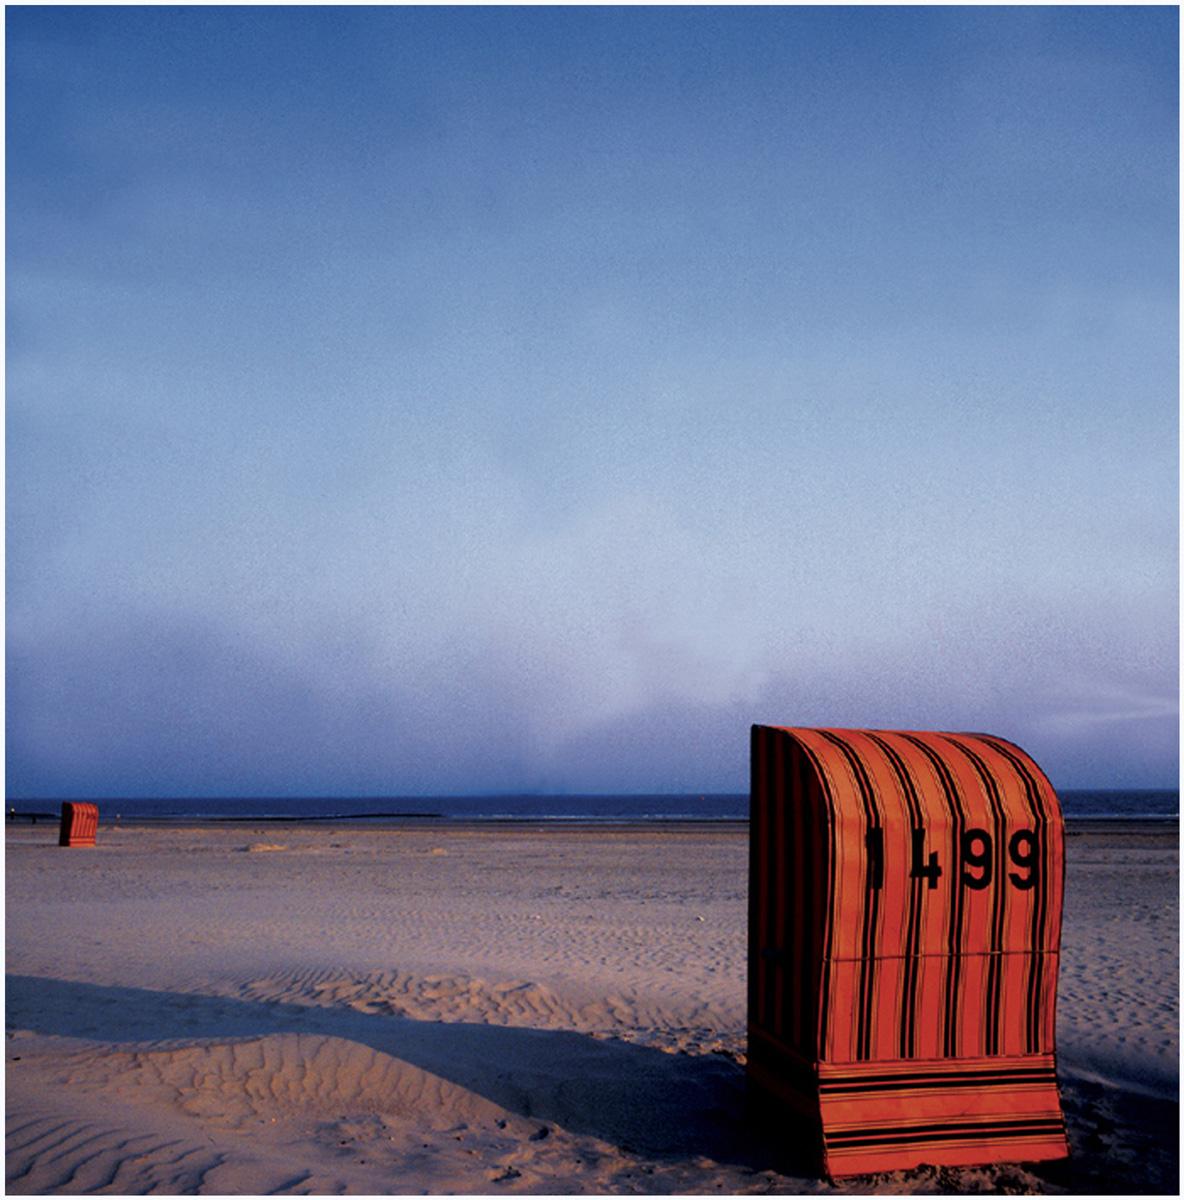 North Sea Water 008 – 017_ROXY27